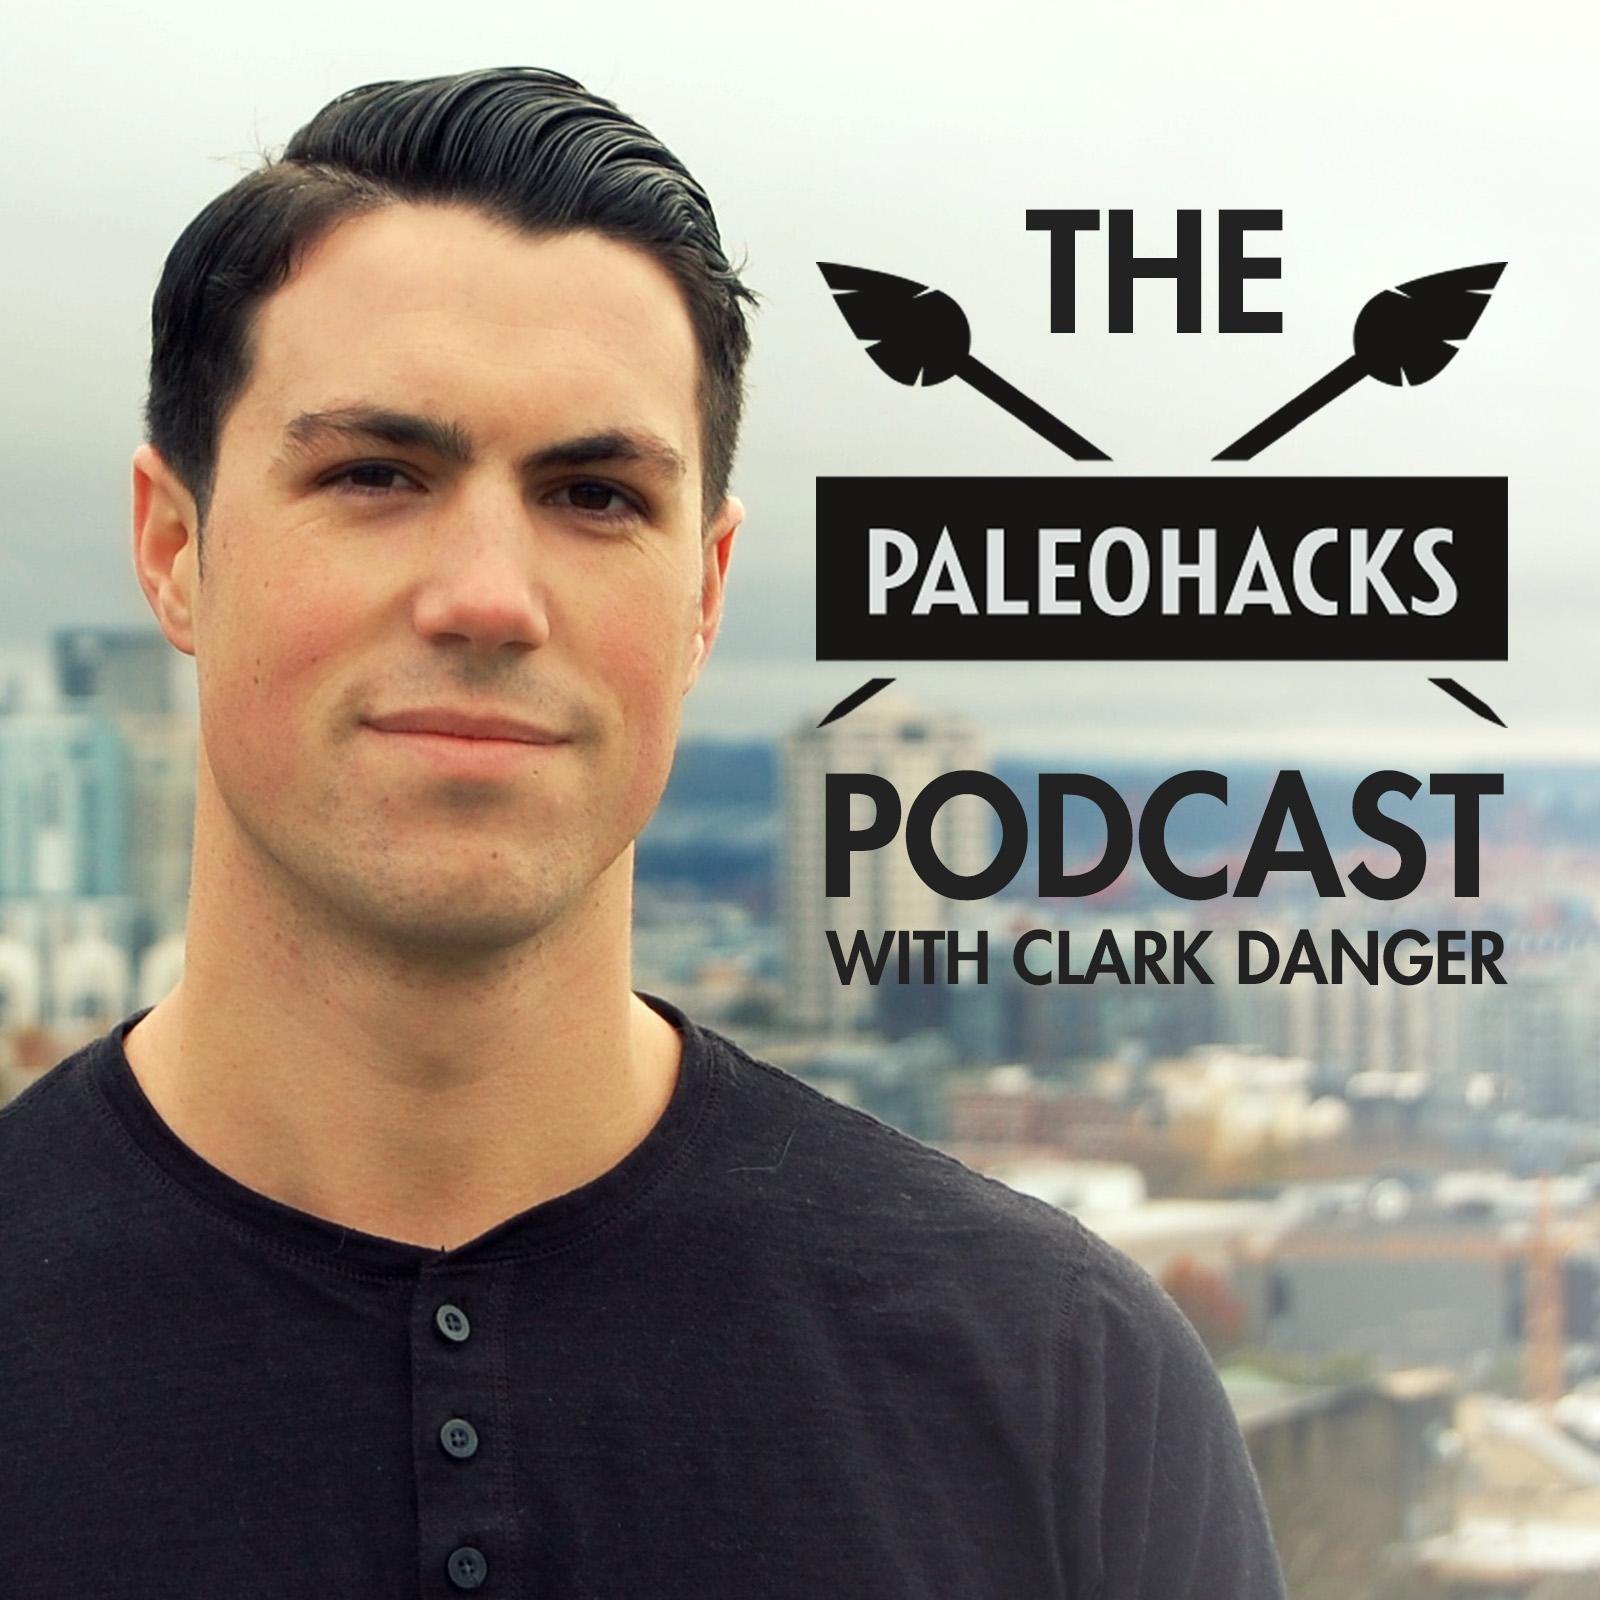 Paleo Blog » The Paleohacks Podcast